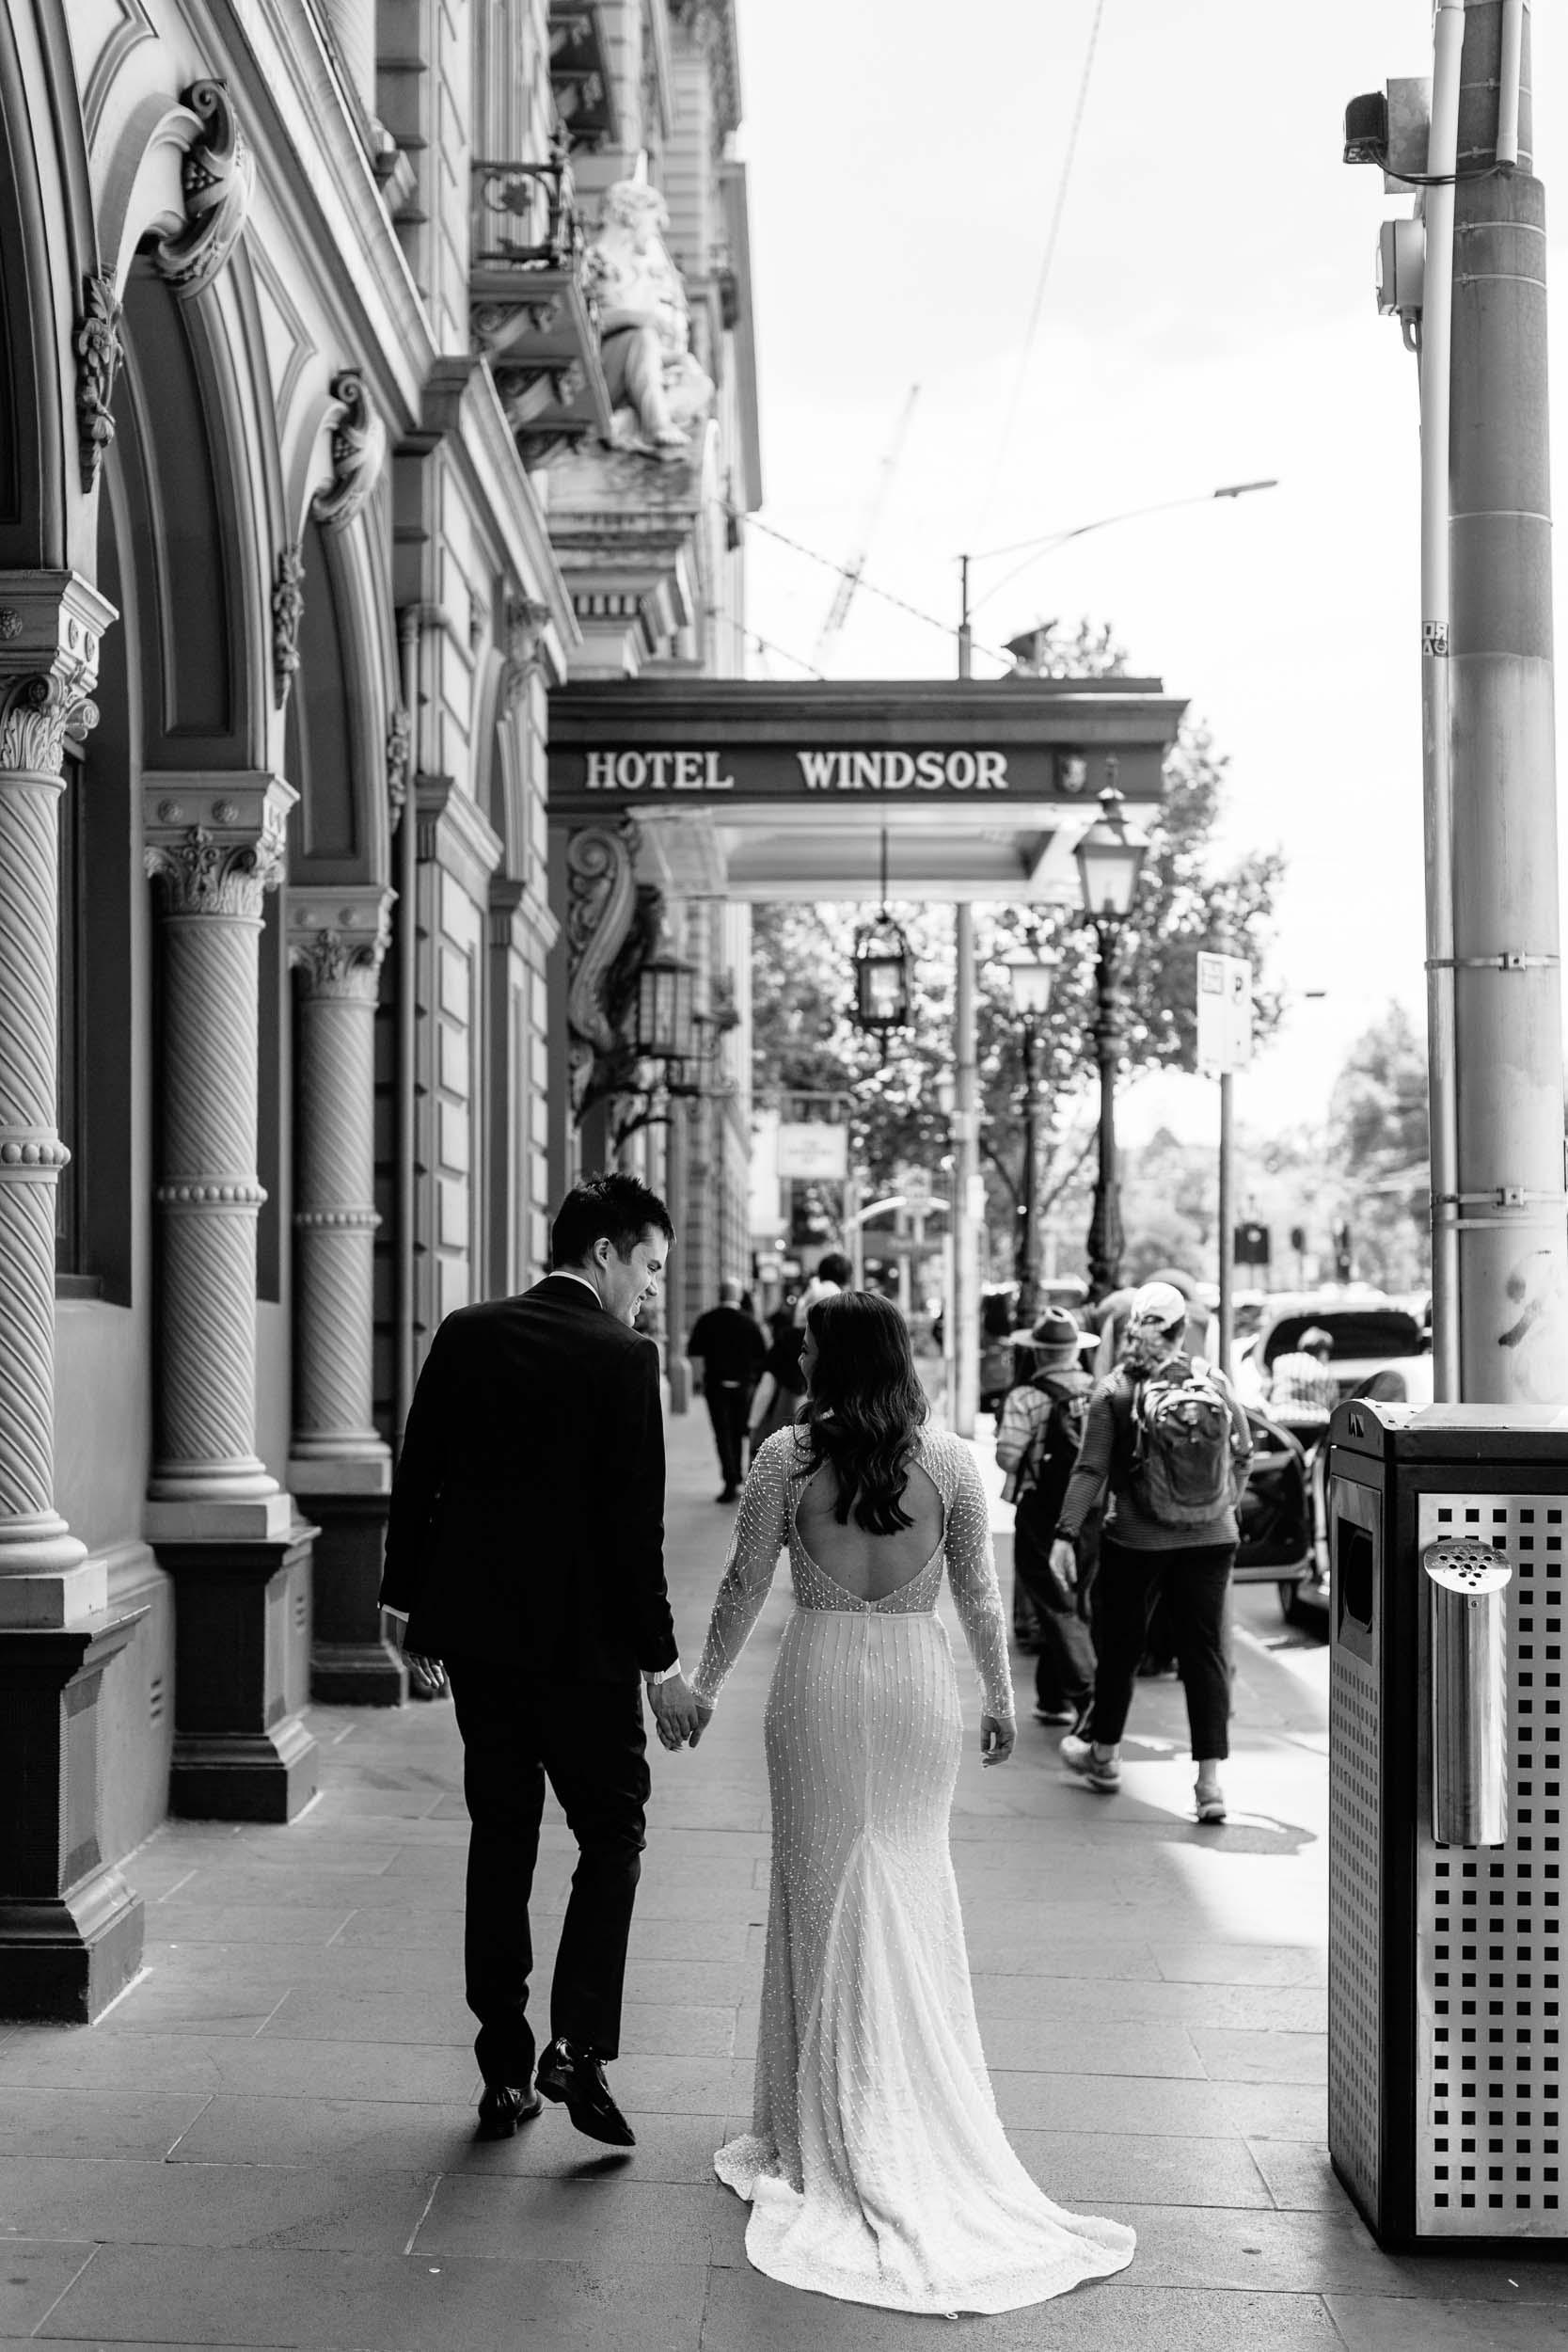 Kas-Richards-Wedding-Photographer-Melbourne-City-Wedding-Alto-Event-Space-Jane-Hill-Bridal-Gown-11.jpg